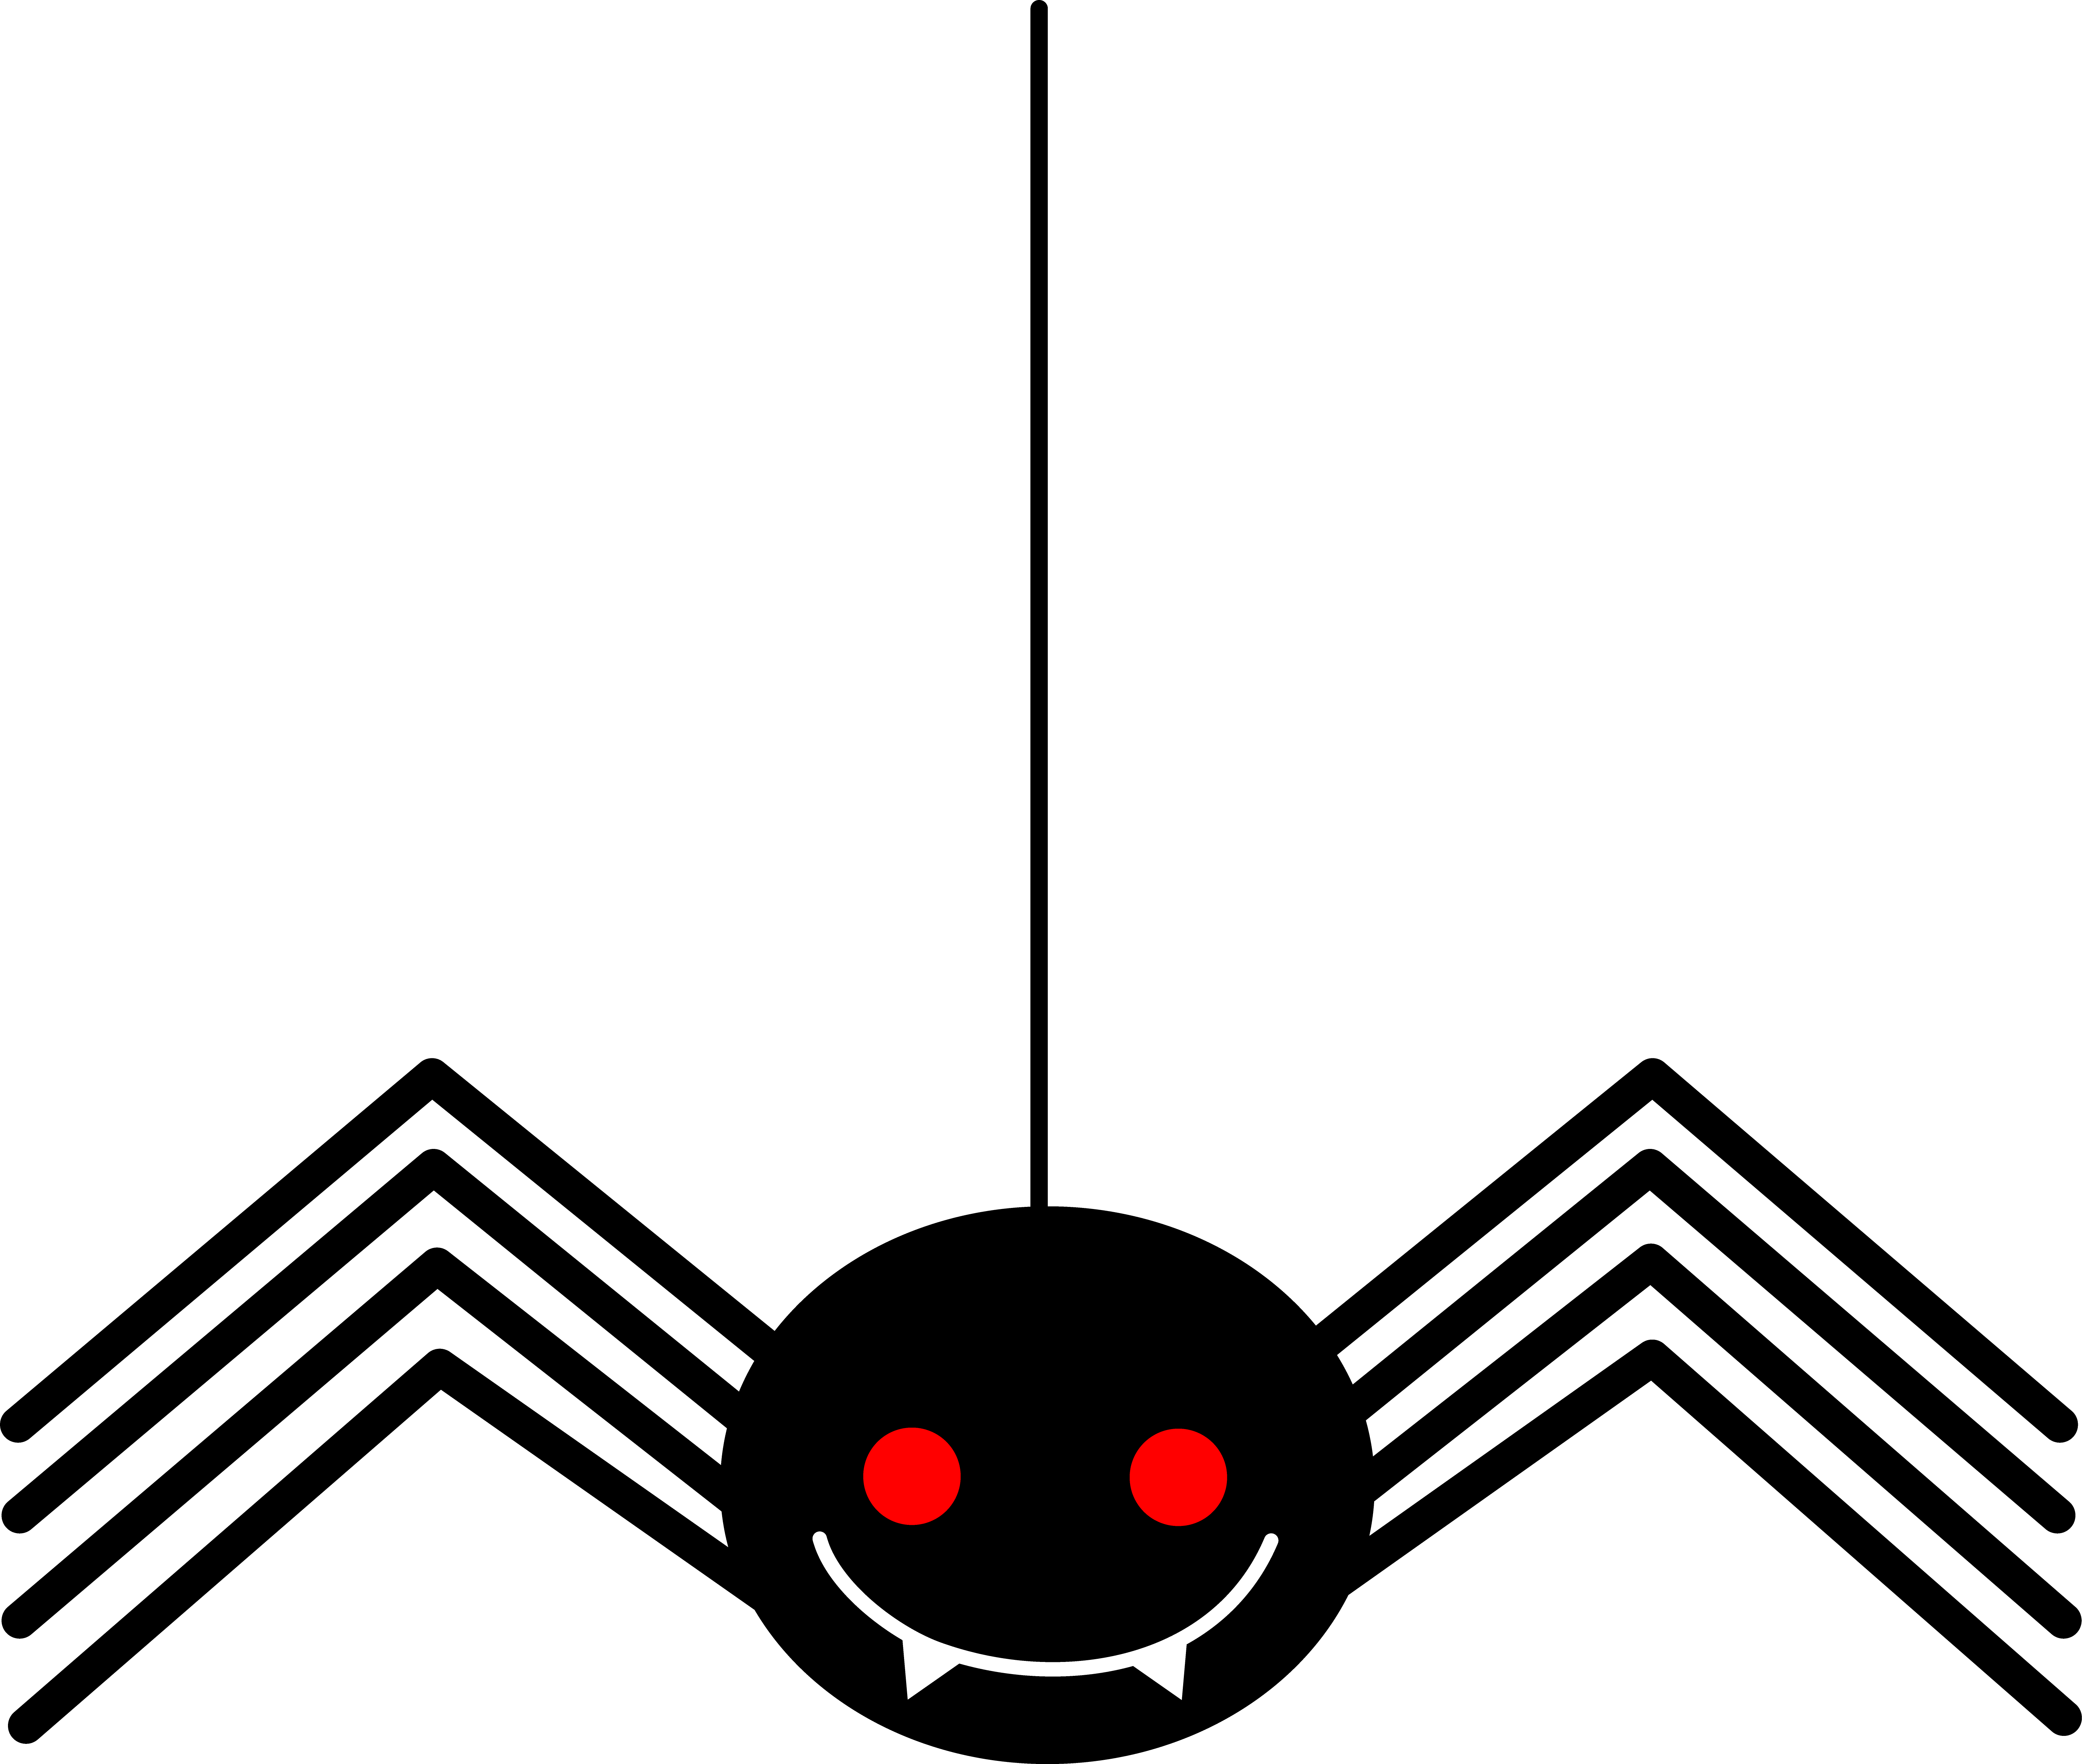 5997x5082 Spooky Little Black Halloween Spider